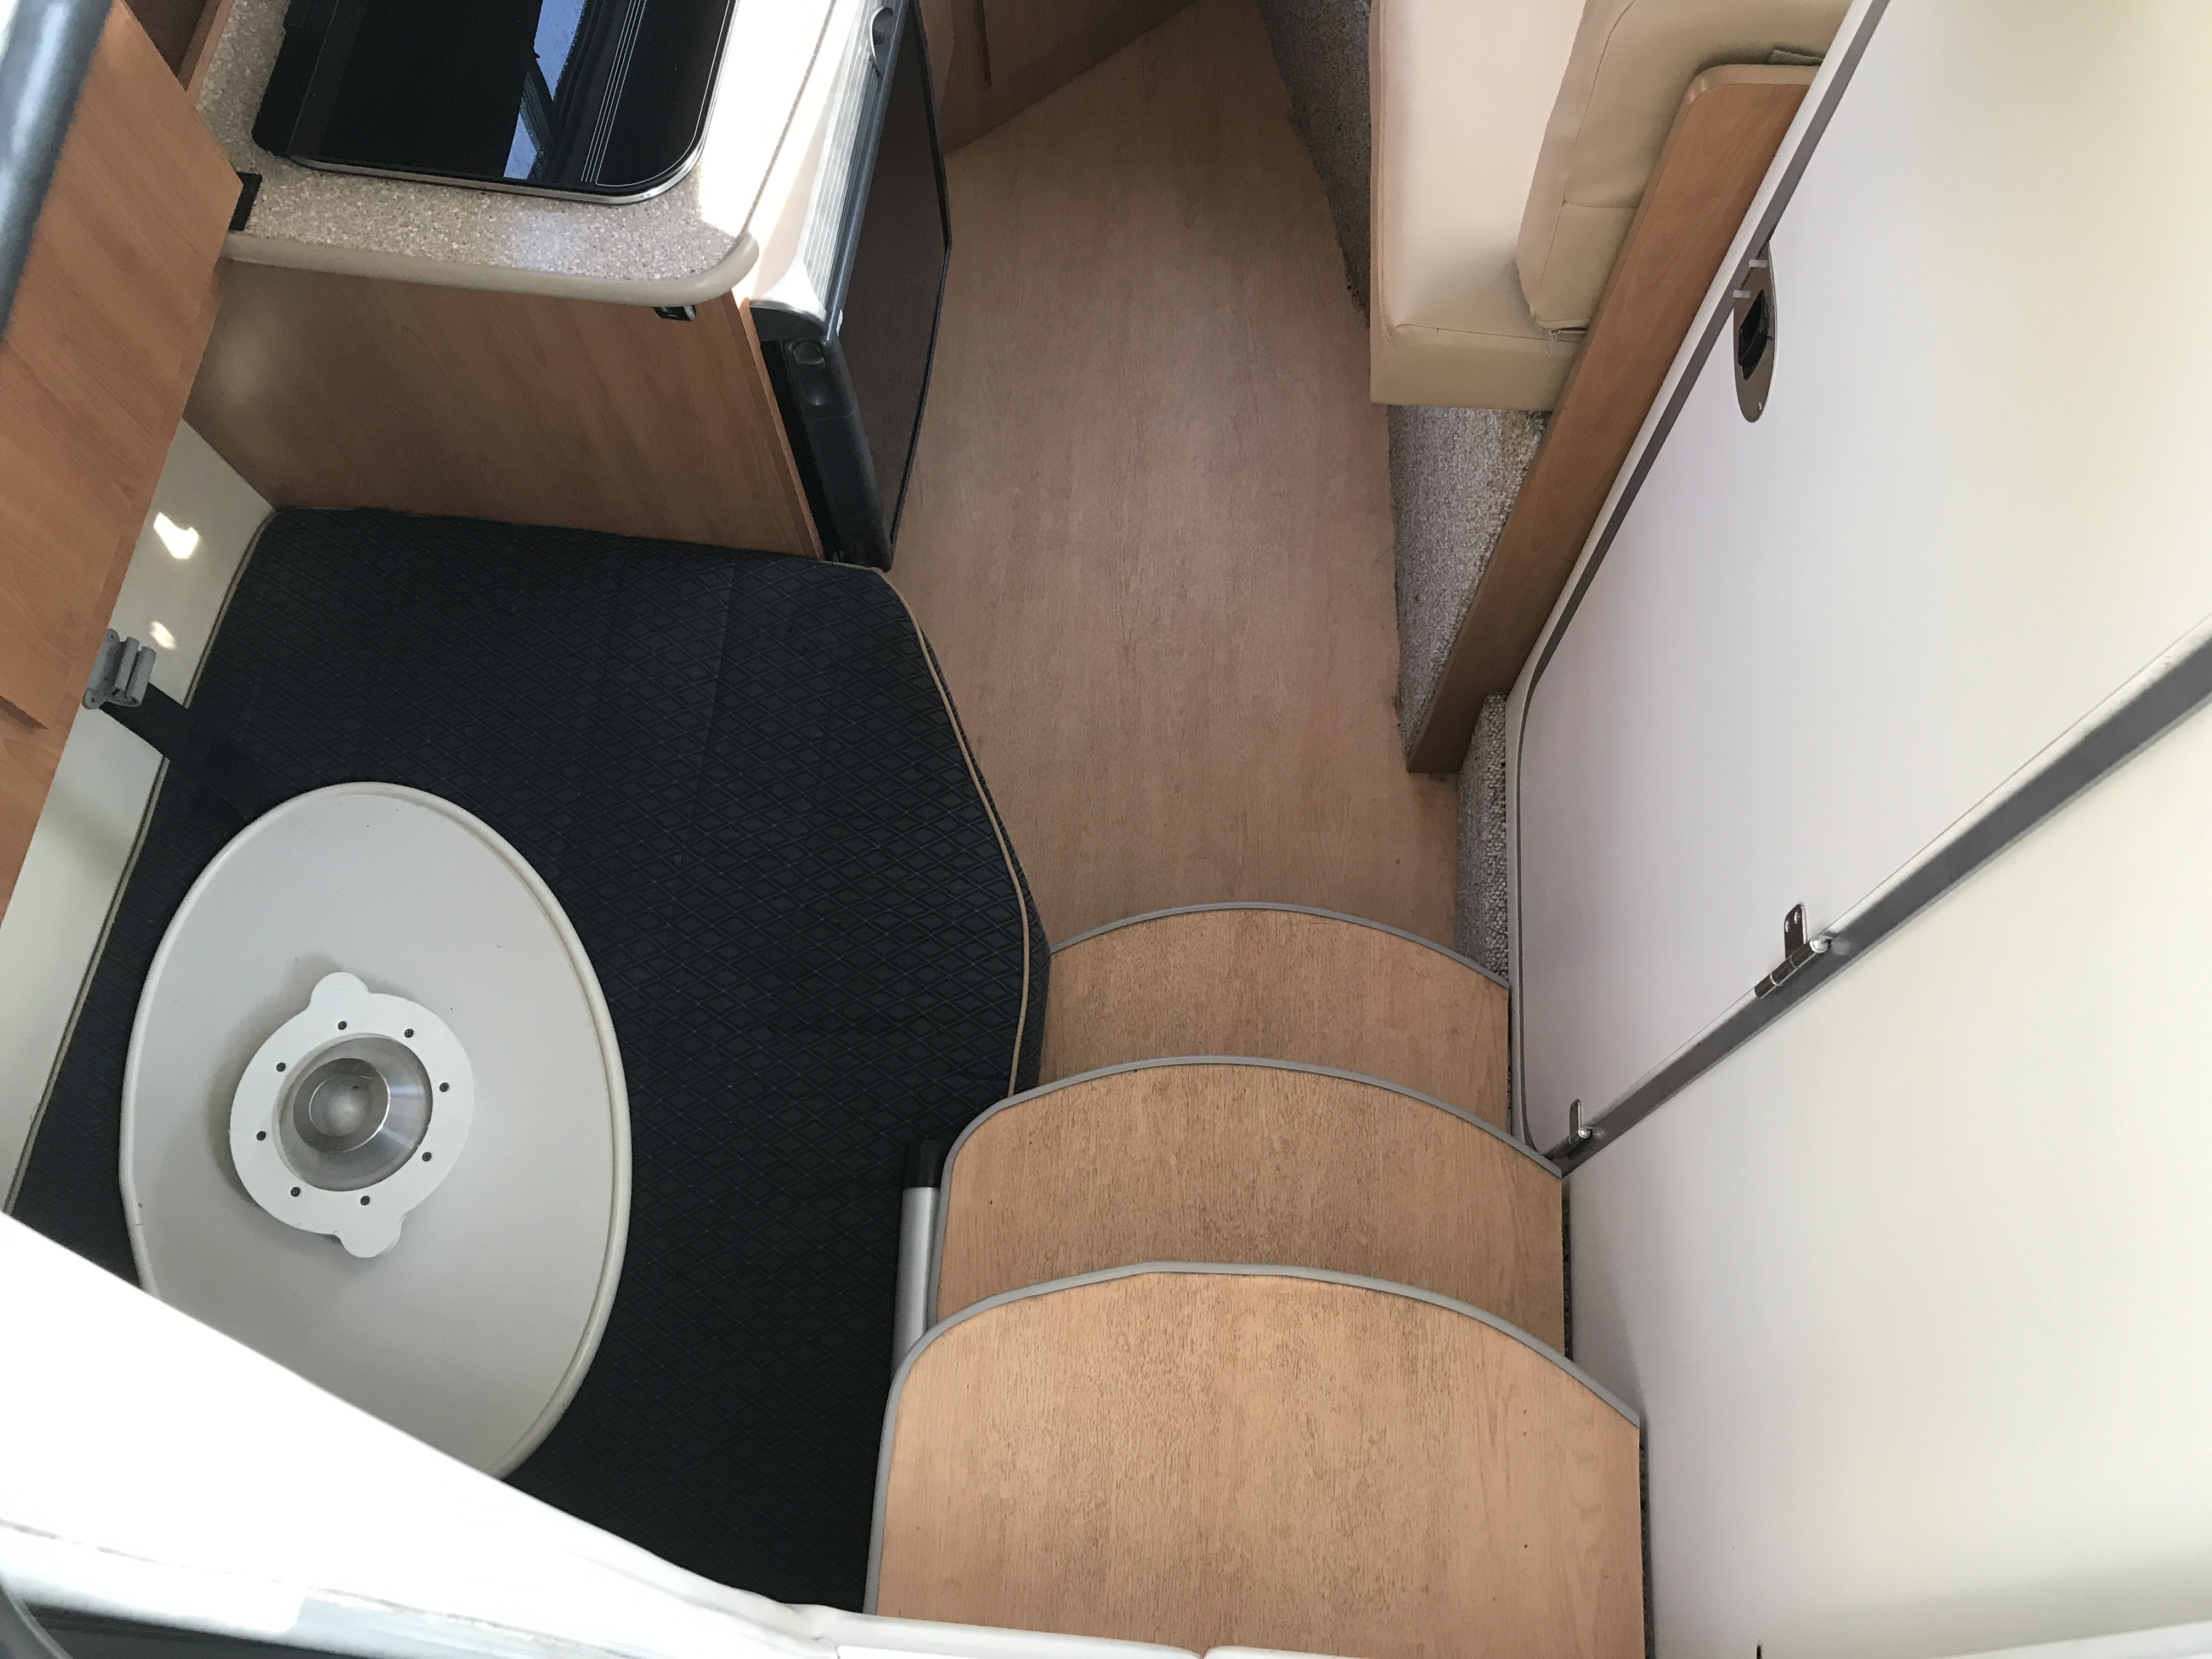 Bayliner Discovery 246 EC - Entering the cabin below deck